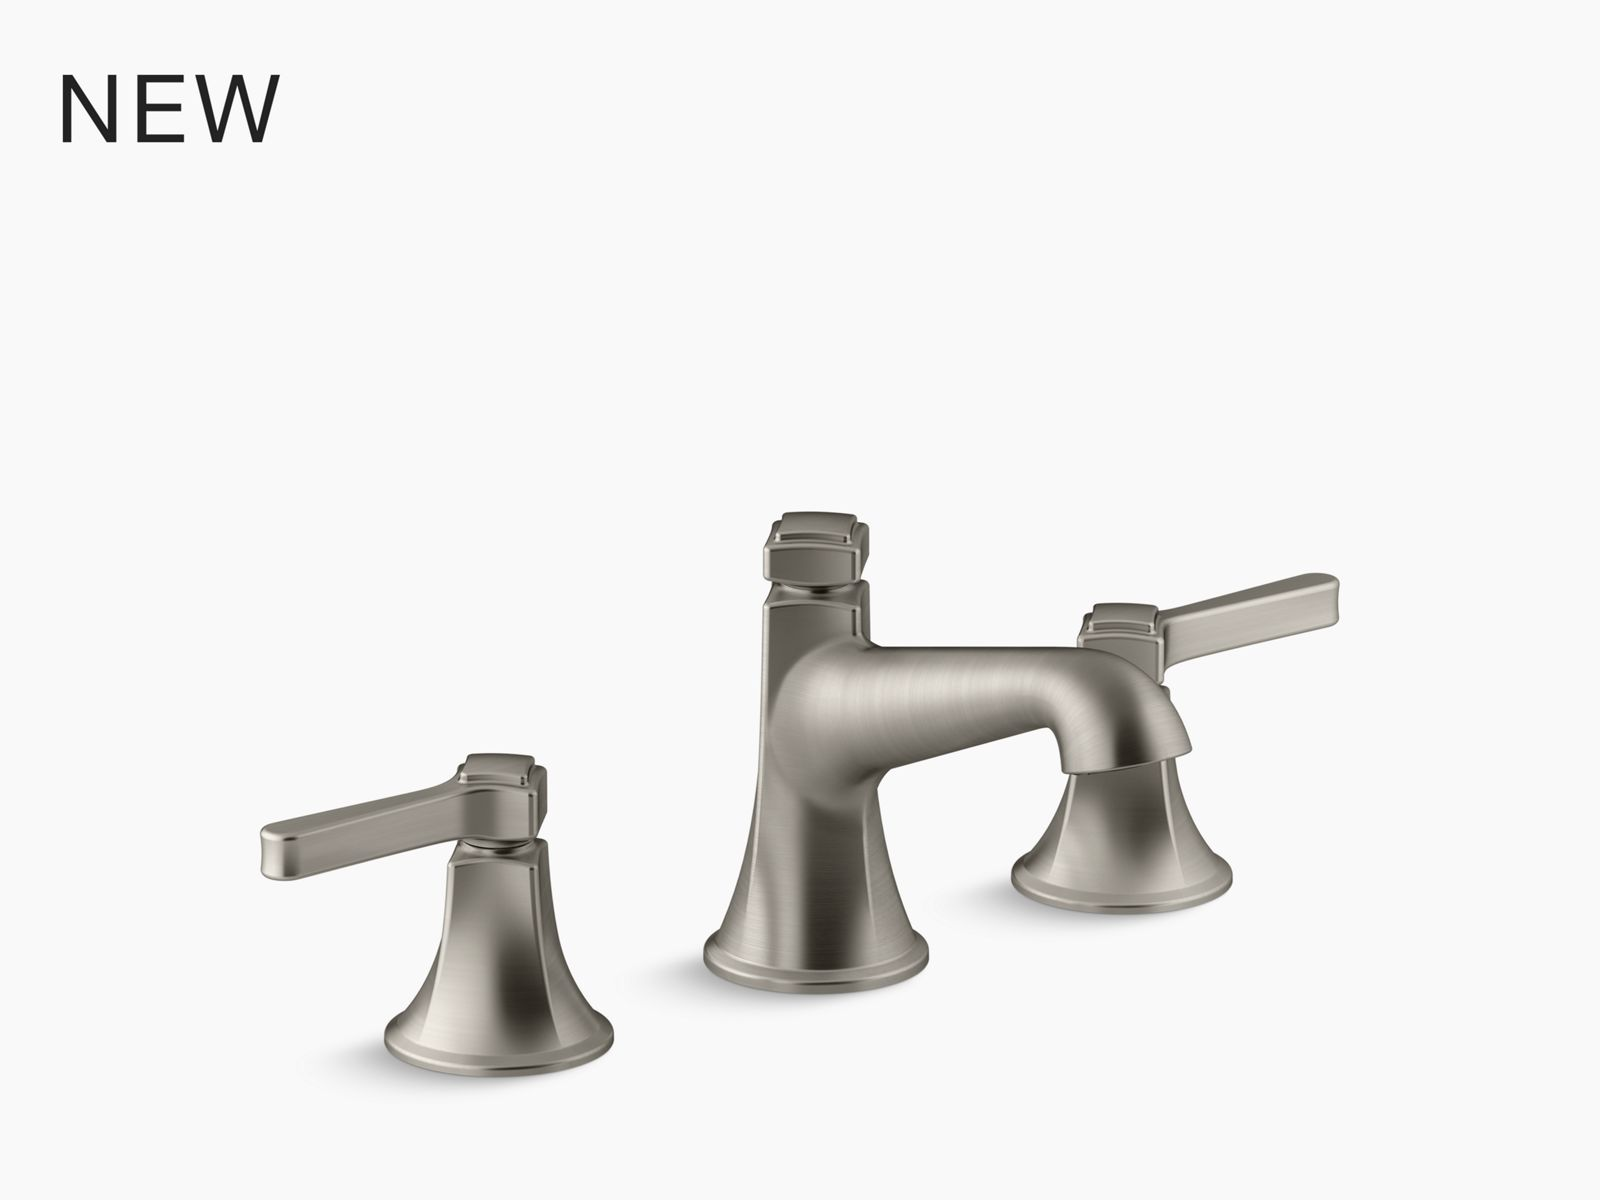 rubicon single handle bathroom faucet